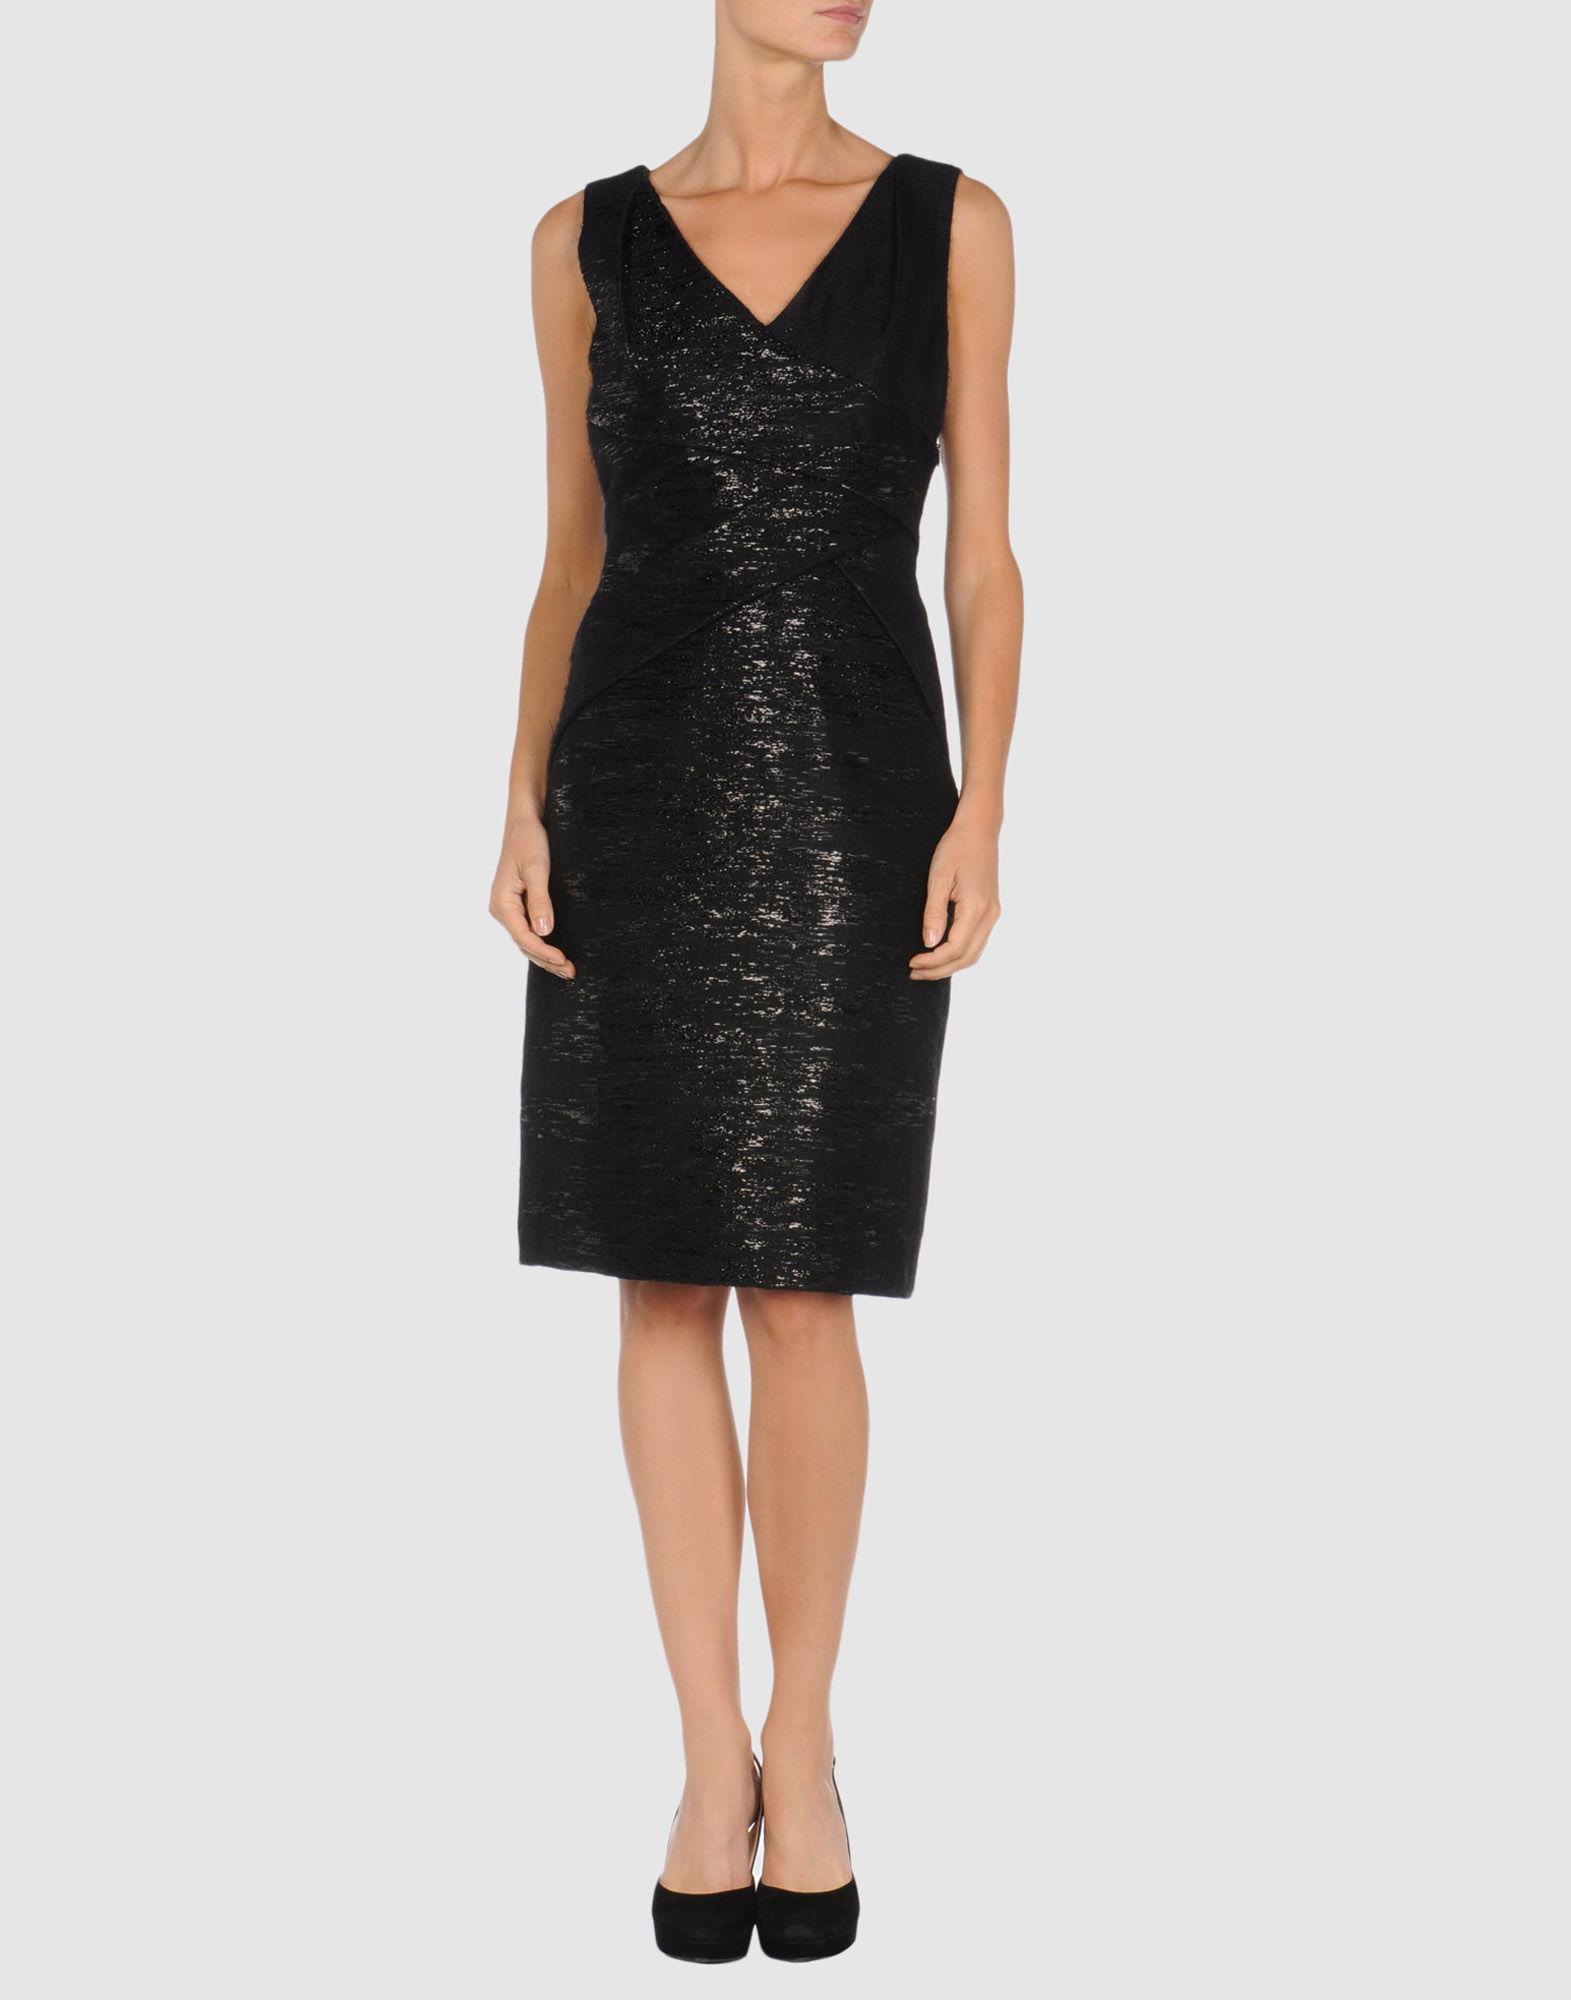 34225003TJ 14 f - Evening Φορεματα Versace 2011 2012 Κωδ.09